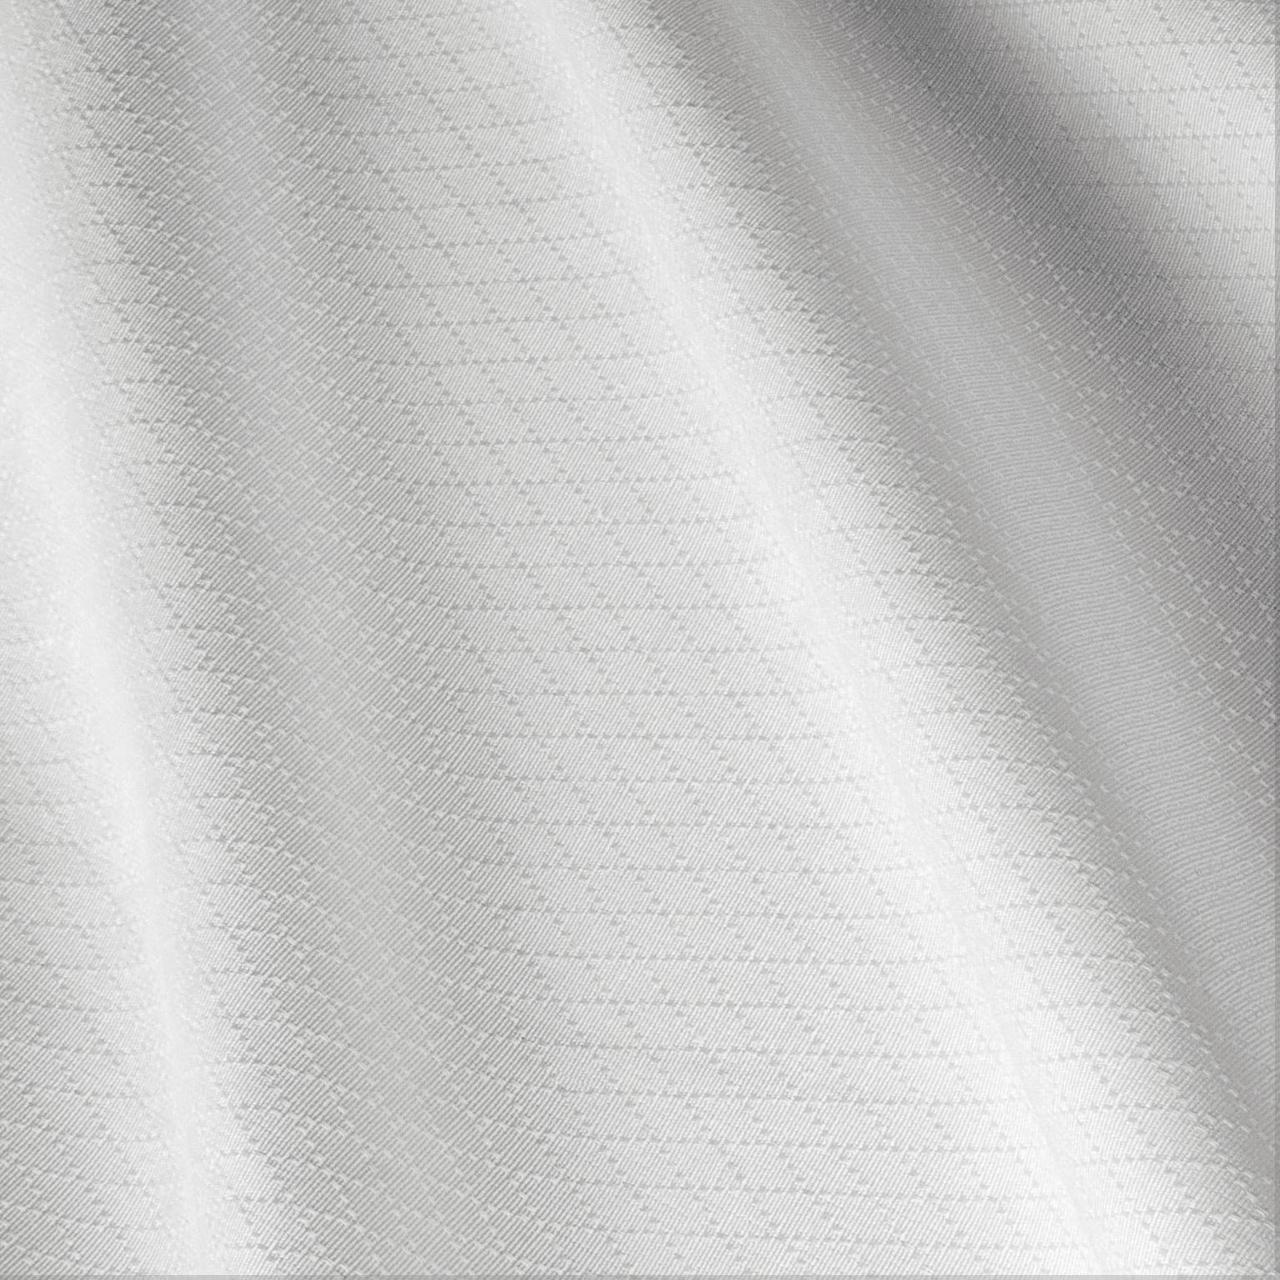 Ткань для скатертей и салфеток (ресторан) 83266v5